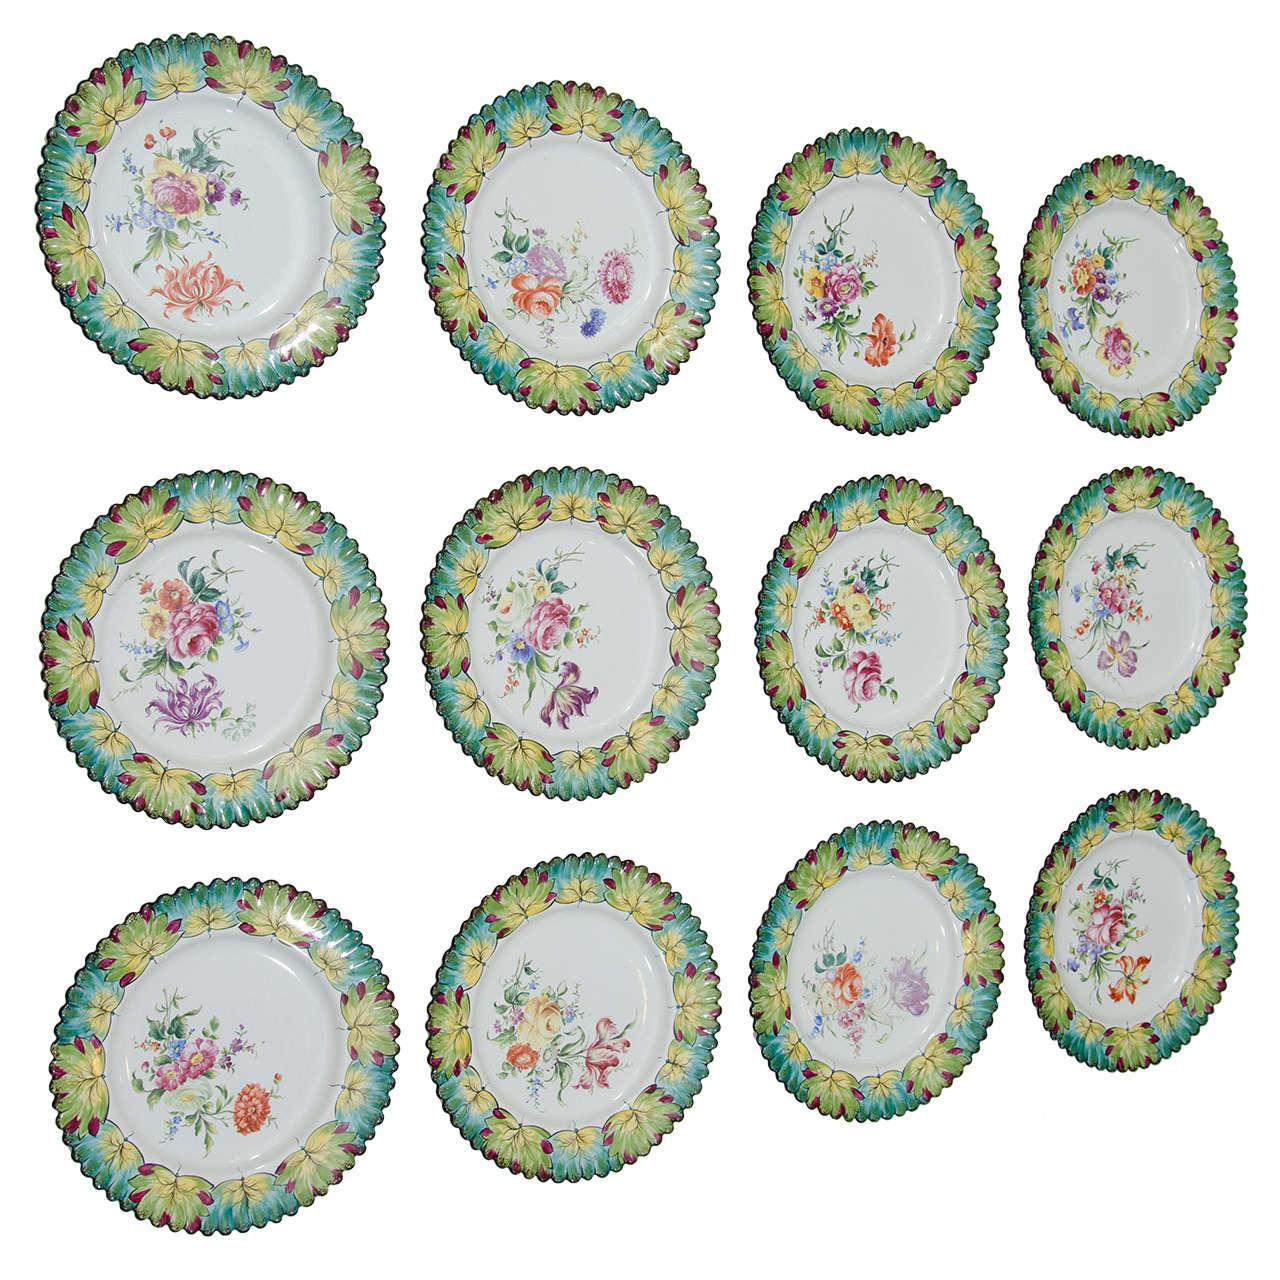 Set of 12 Cauldon Hand-Painted \ Flower Arrangement\  Dessert Plates Cobalt Blue For Sale at 1stdibs  sc 1 st  1stDibs & Set of 12 Cauldon Hand-Painted \